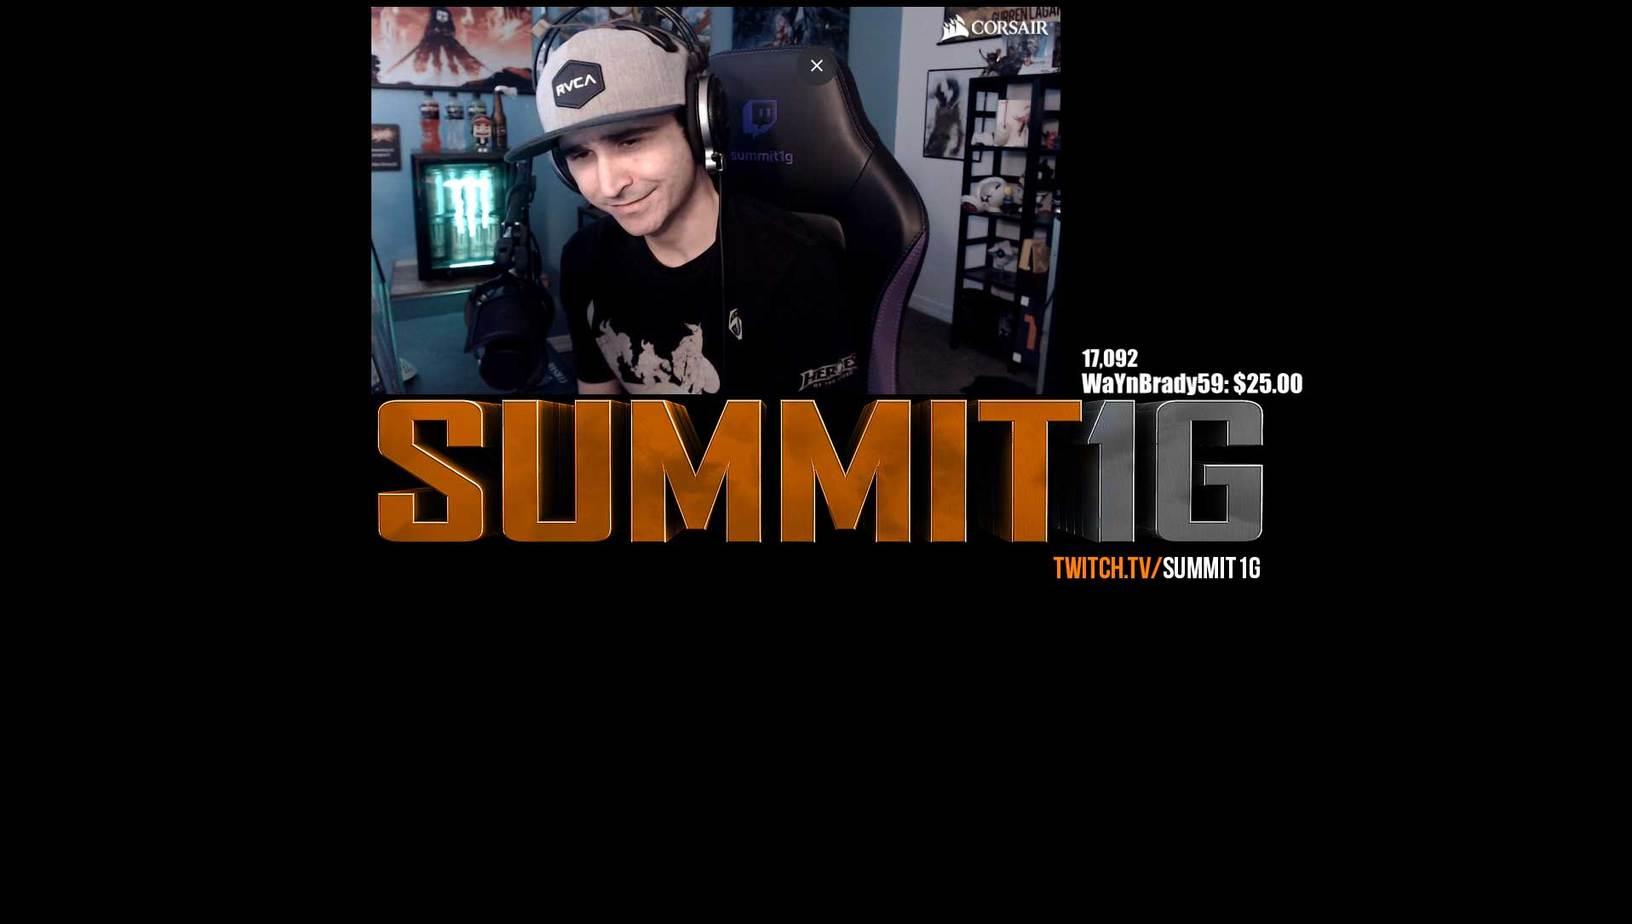 summit1g intermission screen